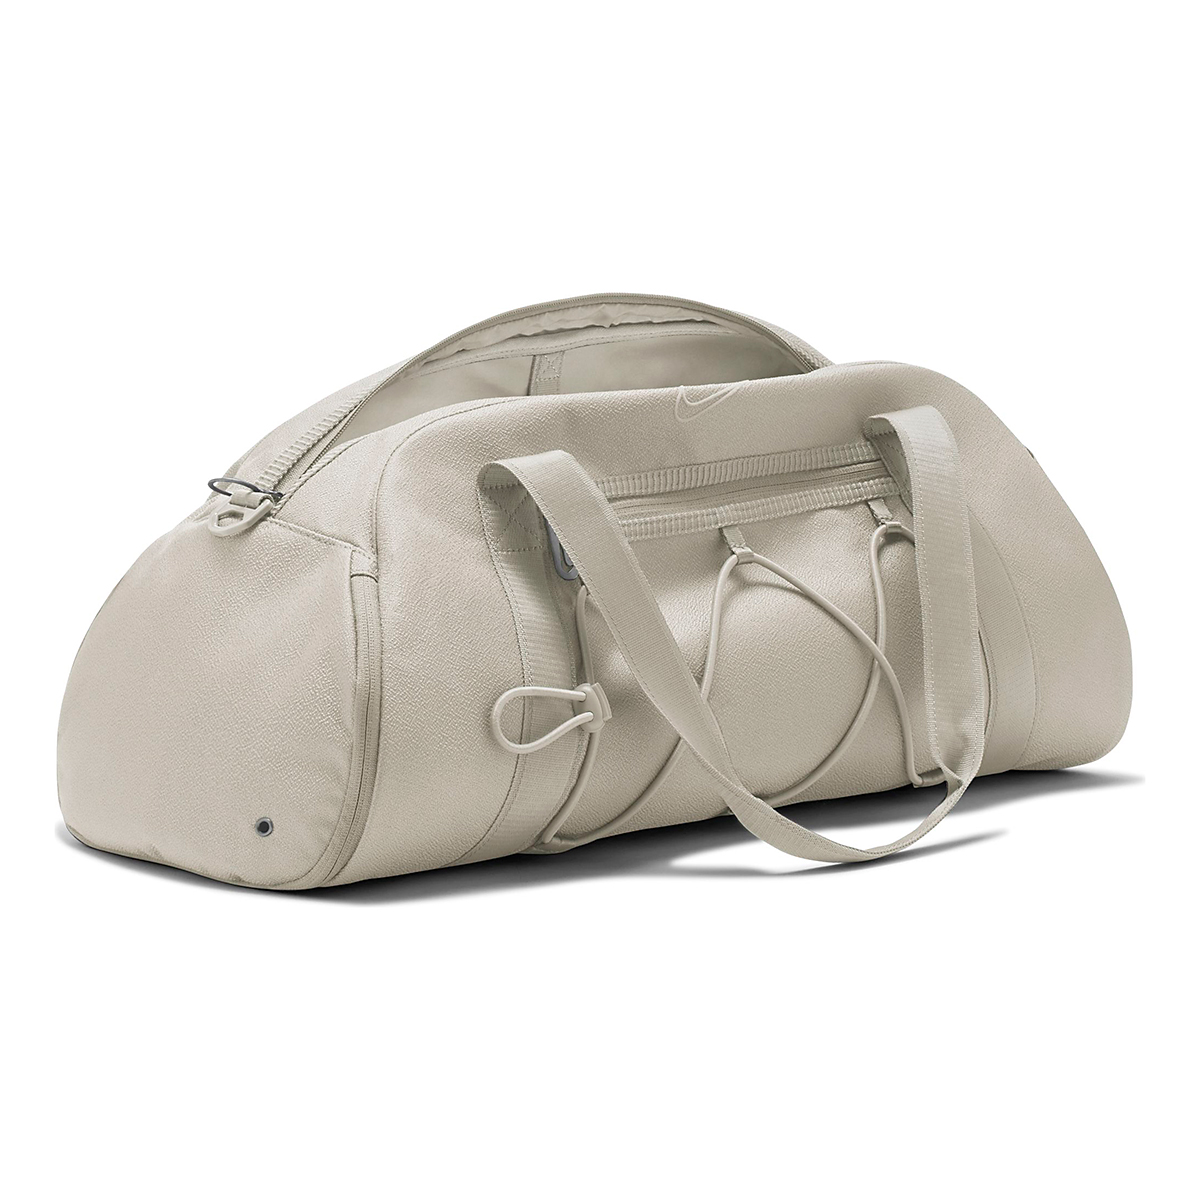 Women's Nike One Club Duffel Bag, , large, image 4